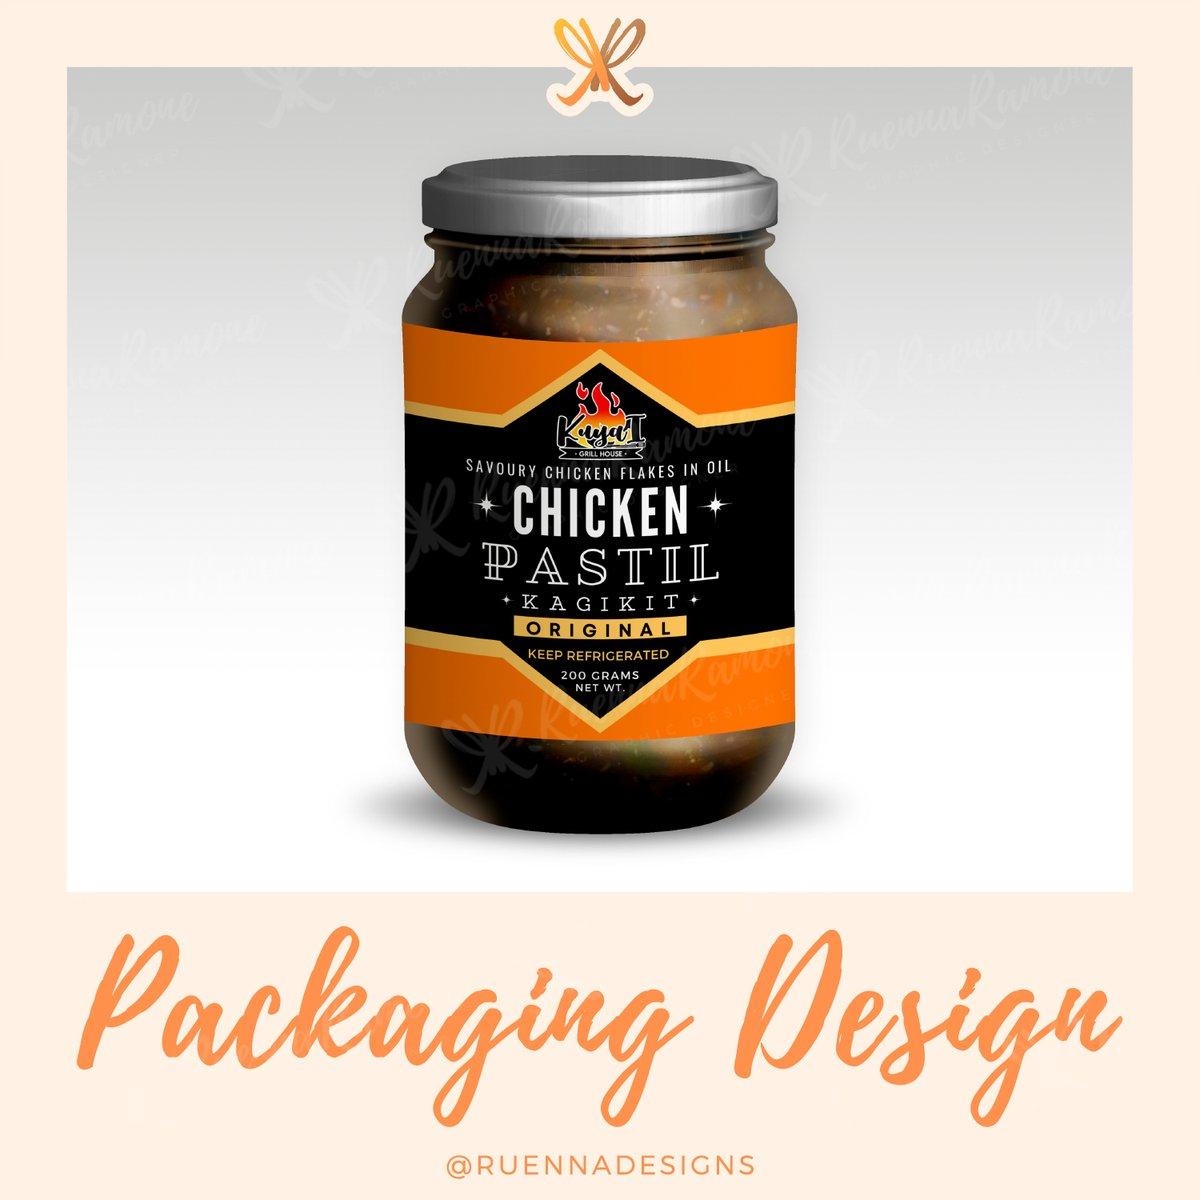 #ruennadesigns #graphicdesigner #differencemaker #creativewomen #fvacreatives #packagingdesign #photoshop #mockup #chickenpastil #davaofood #businessdesign https://t.co/vTOoou7kZB